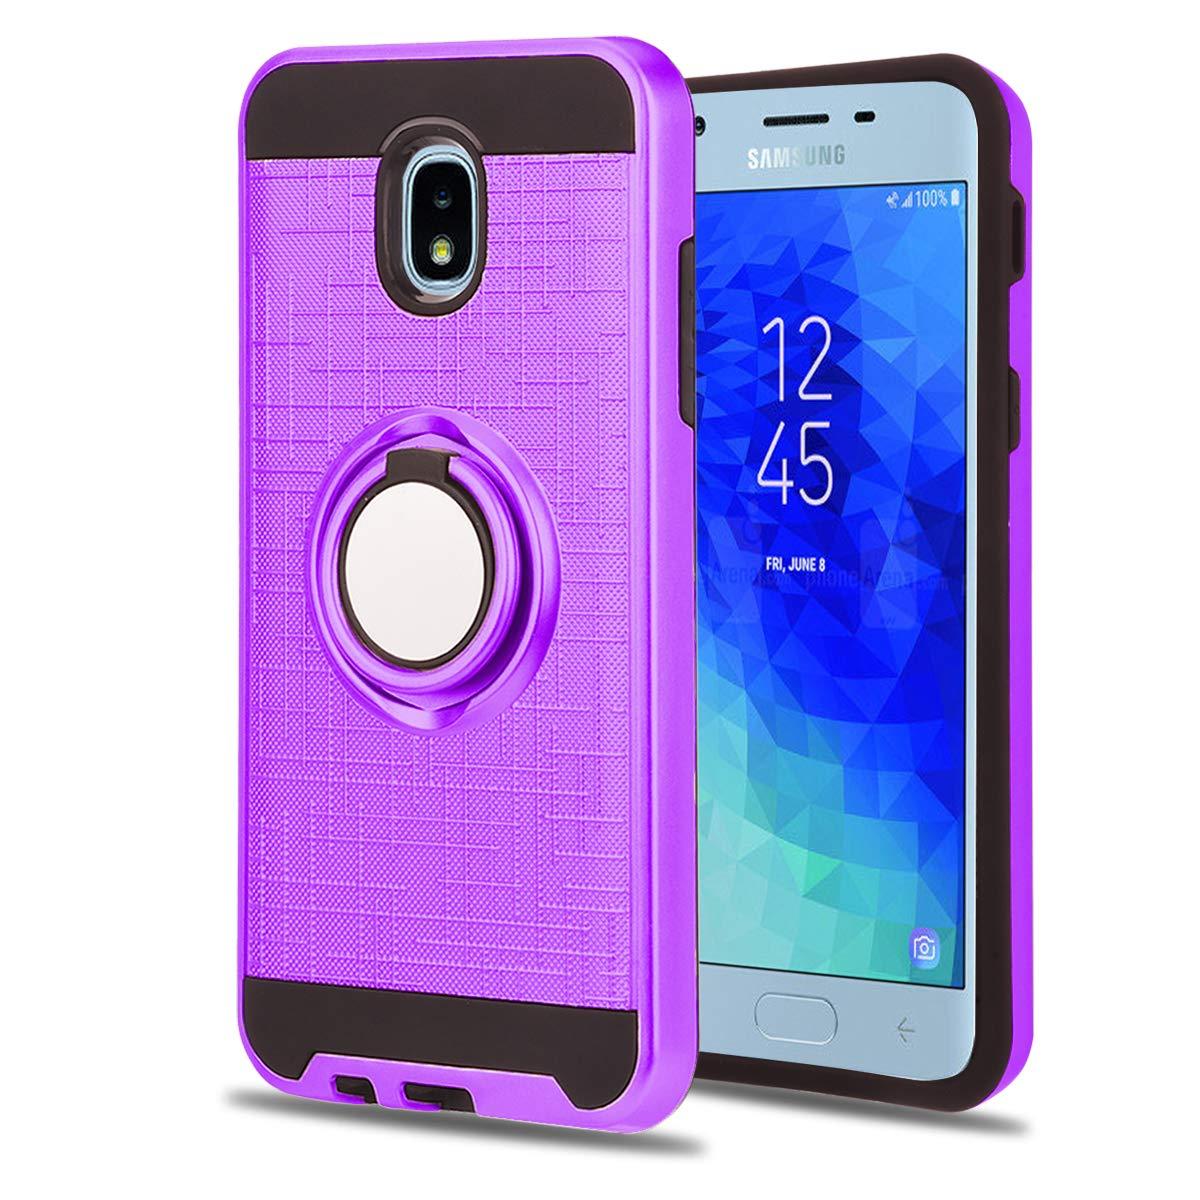 HD Screen Protector for J737T-HM Black Ymhxcy Samsung Galaxy J7 2018//J7 V 2nd Gen//J7 Refine//J7 Aero//J7 Star//J7 Top//J7 Crown//J7 Aura//J7 Eon//J737V Rotating Bracket Case with Card Slots Wallet Holder